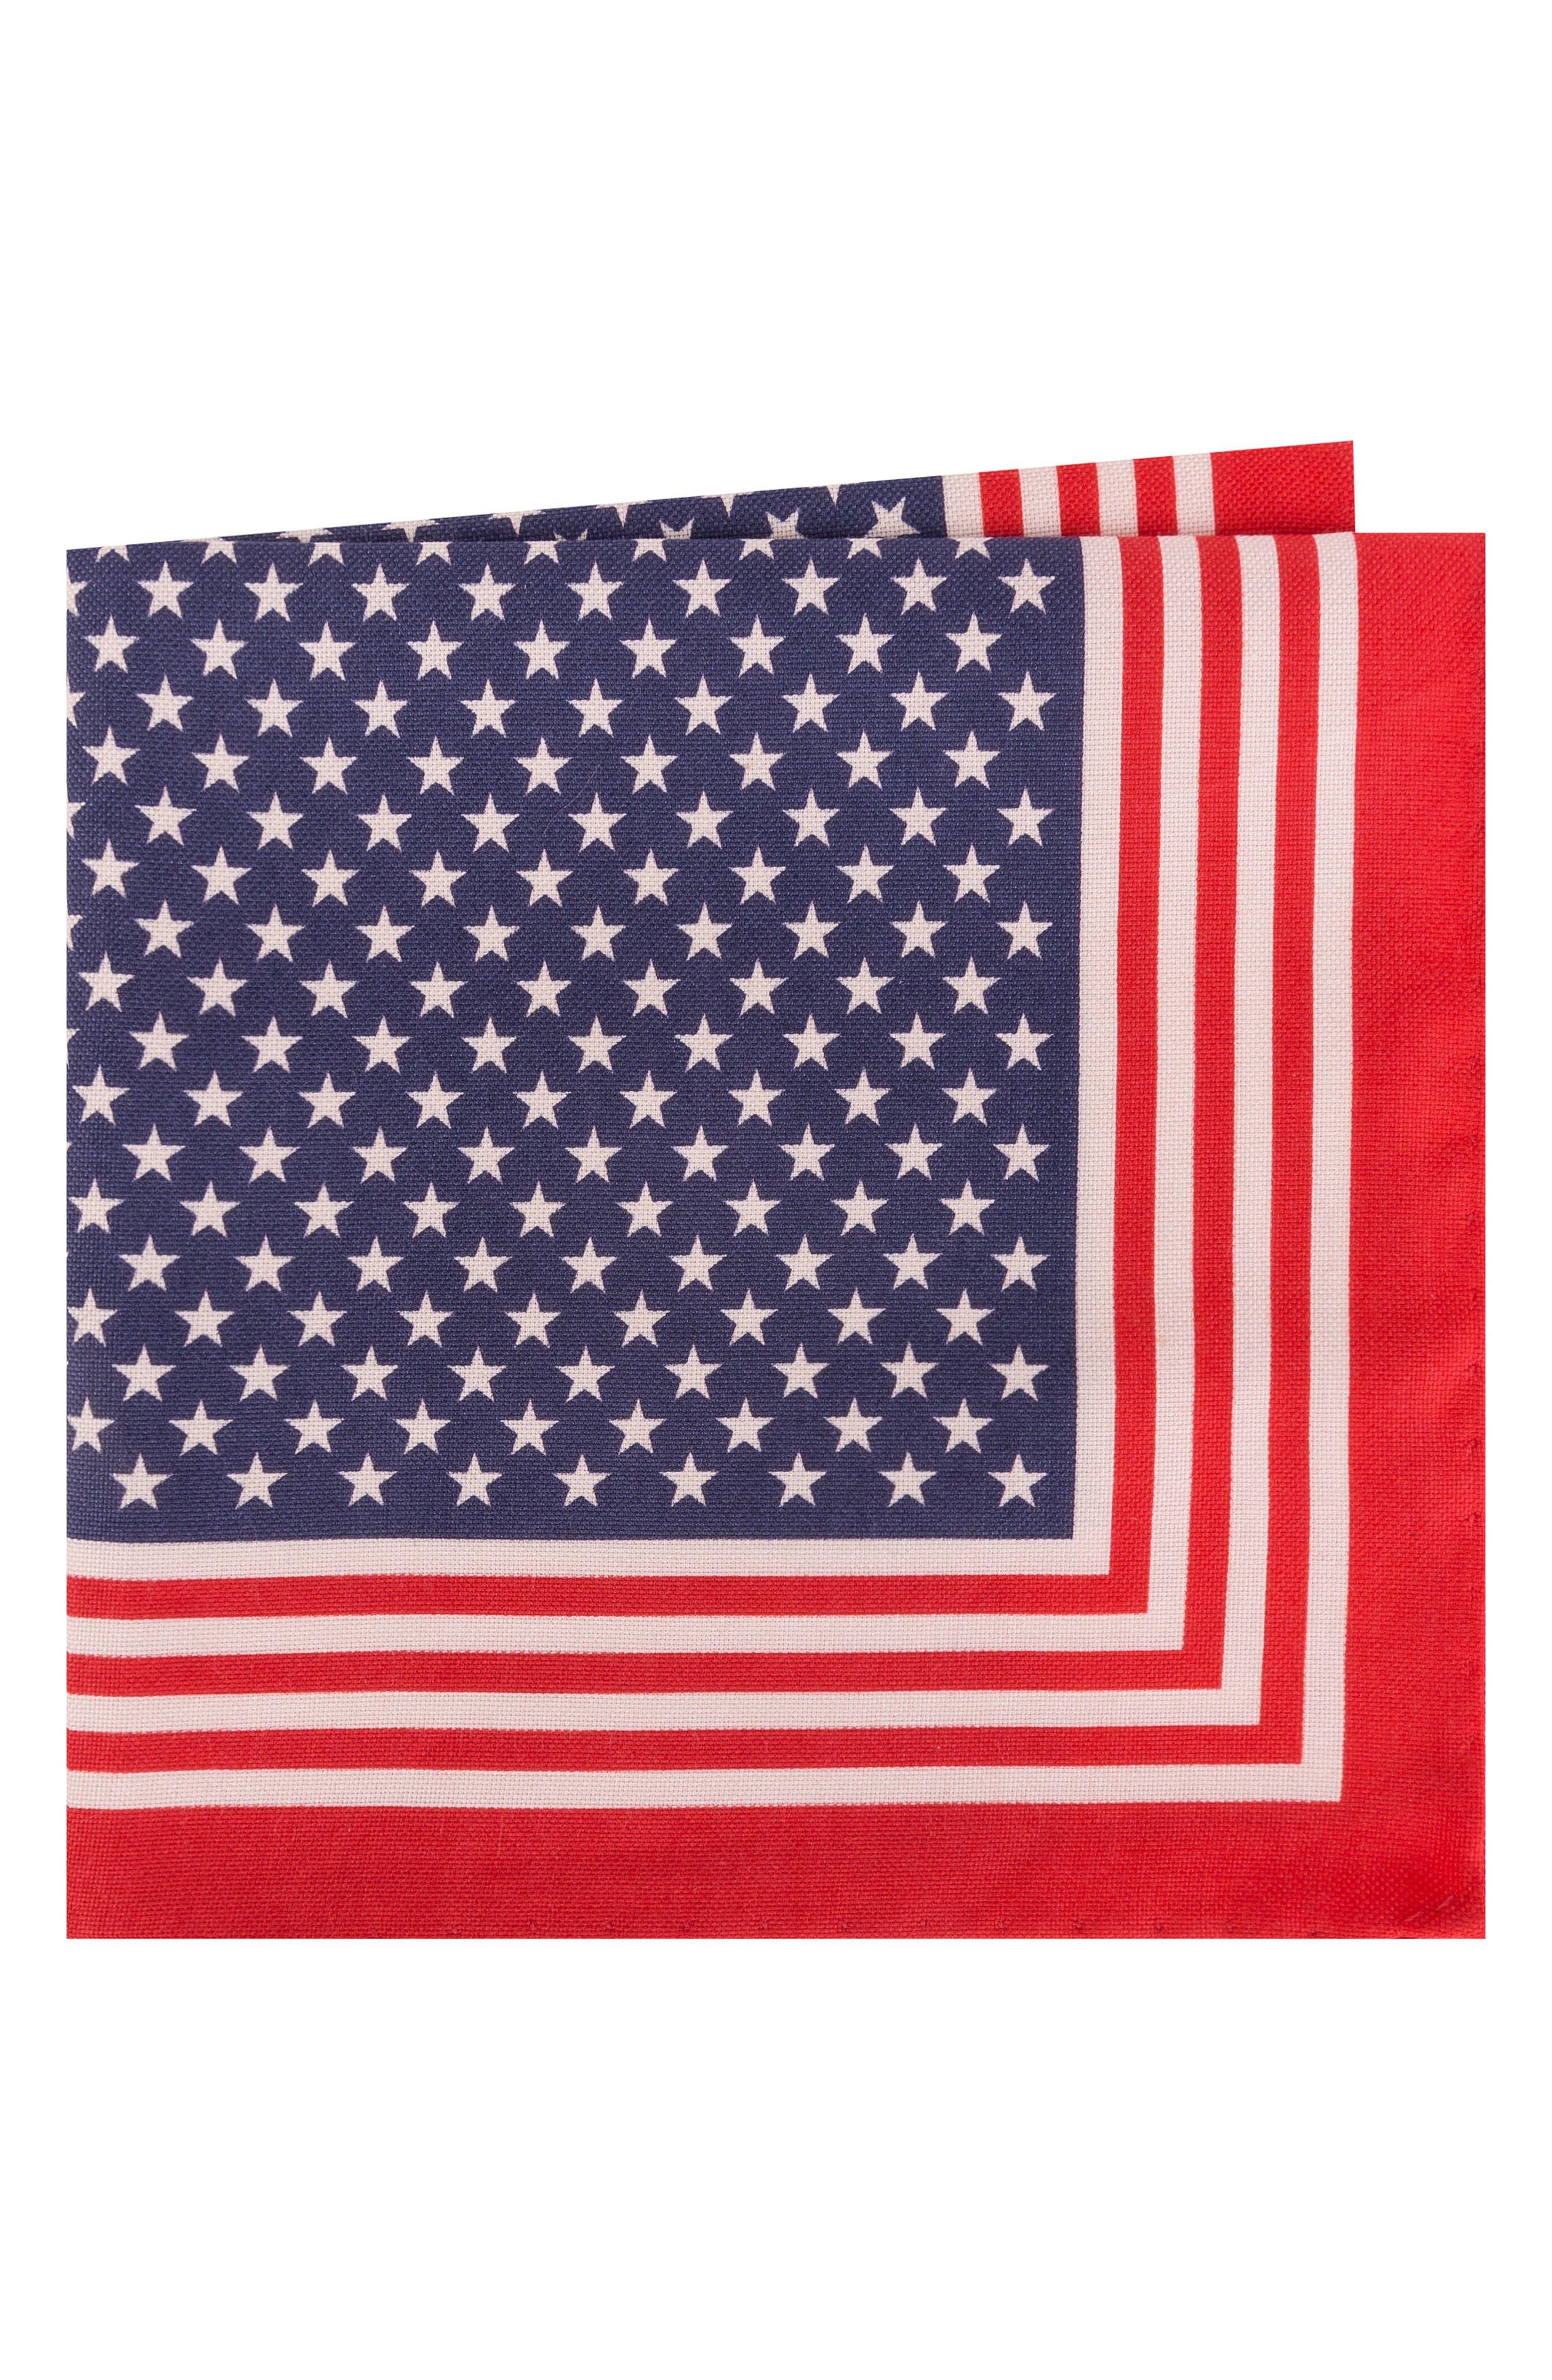 Main Image - Ted Baker London Stars & Stripes Cotton & Silk Pocket Square